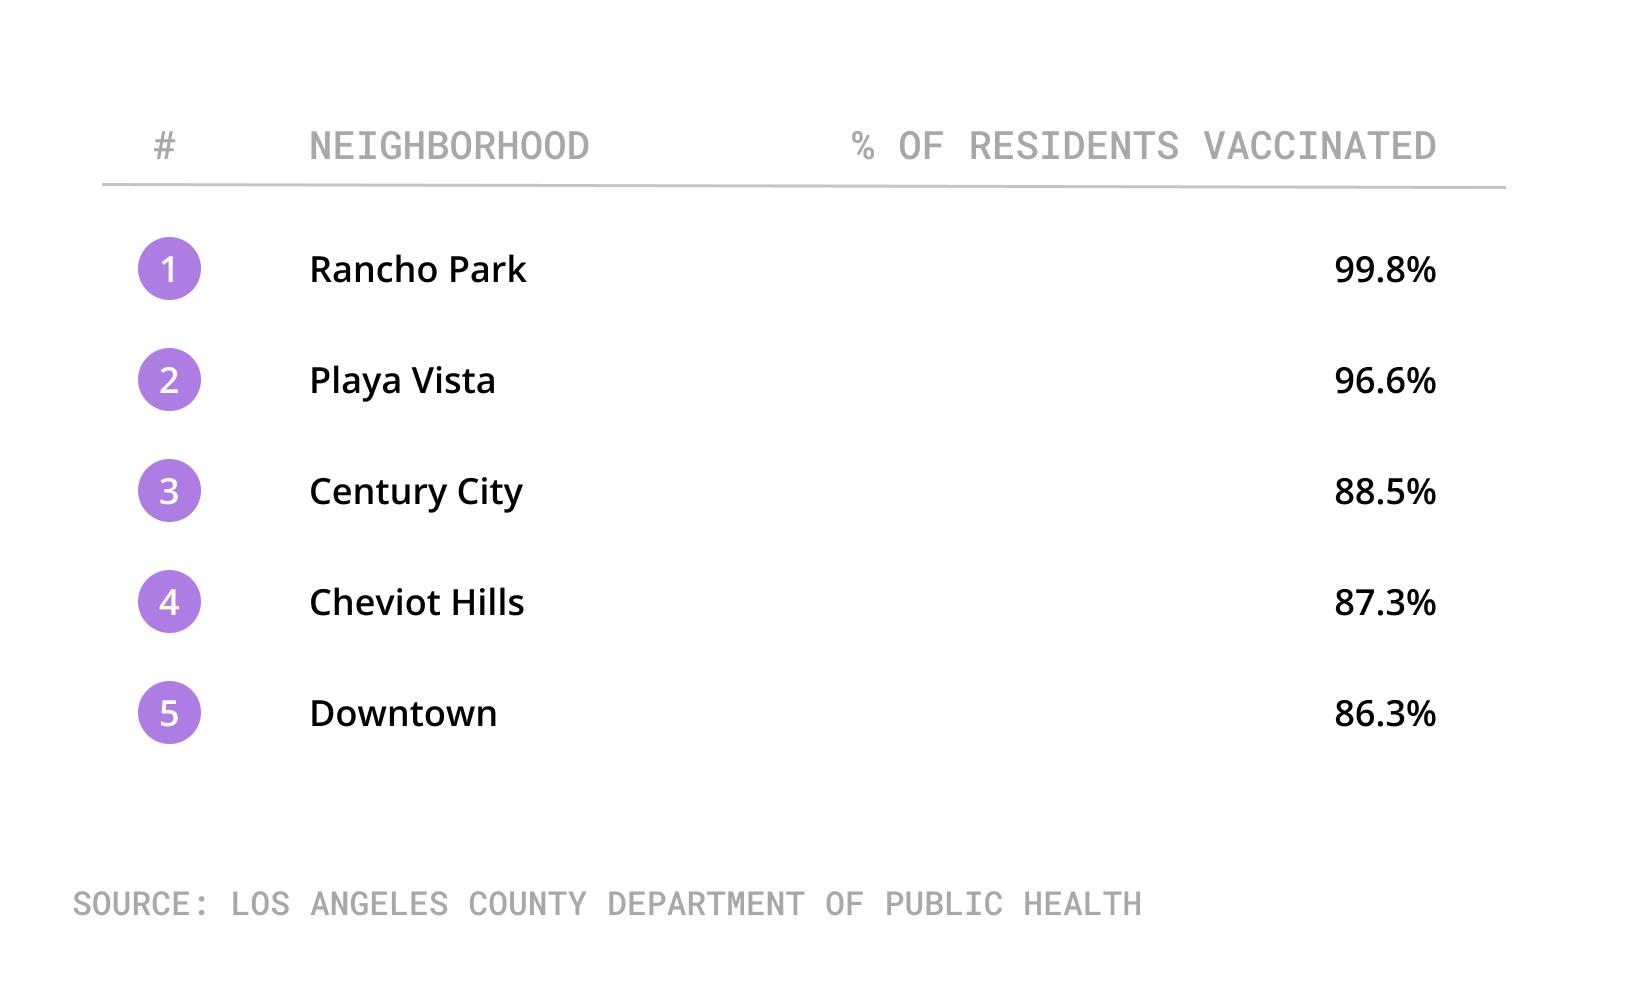 Neighborhoods With Highest Vax Percentage 16+